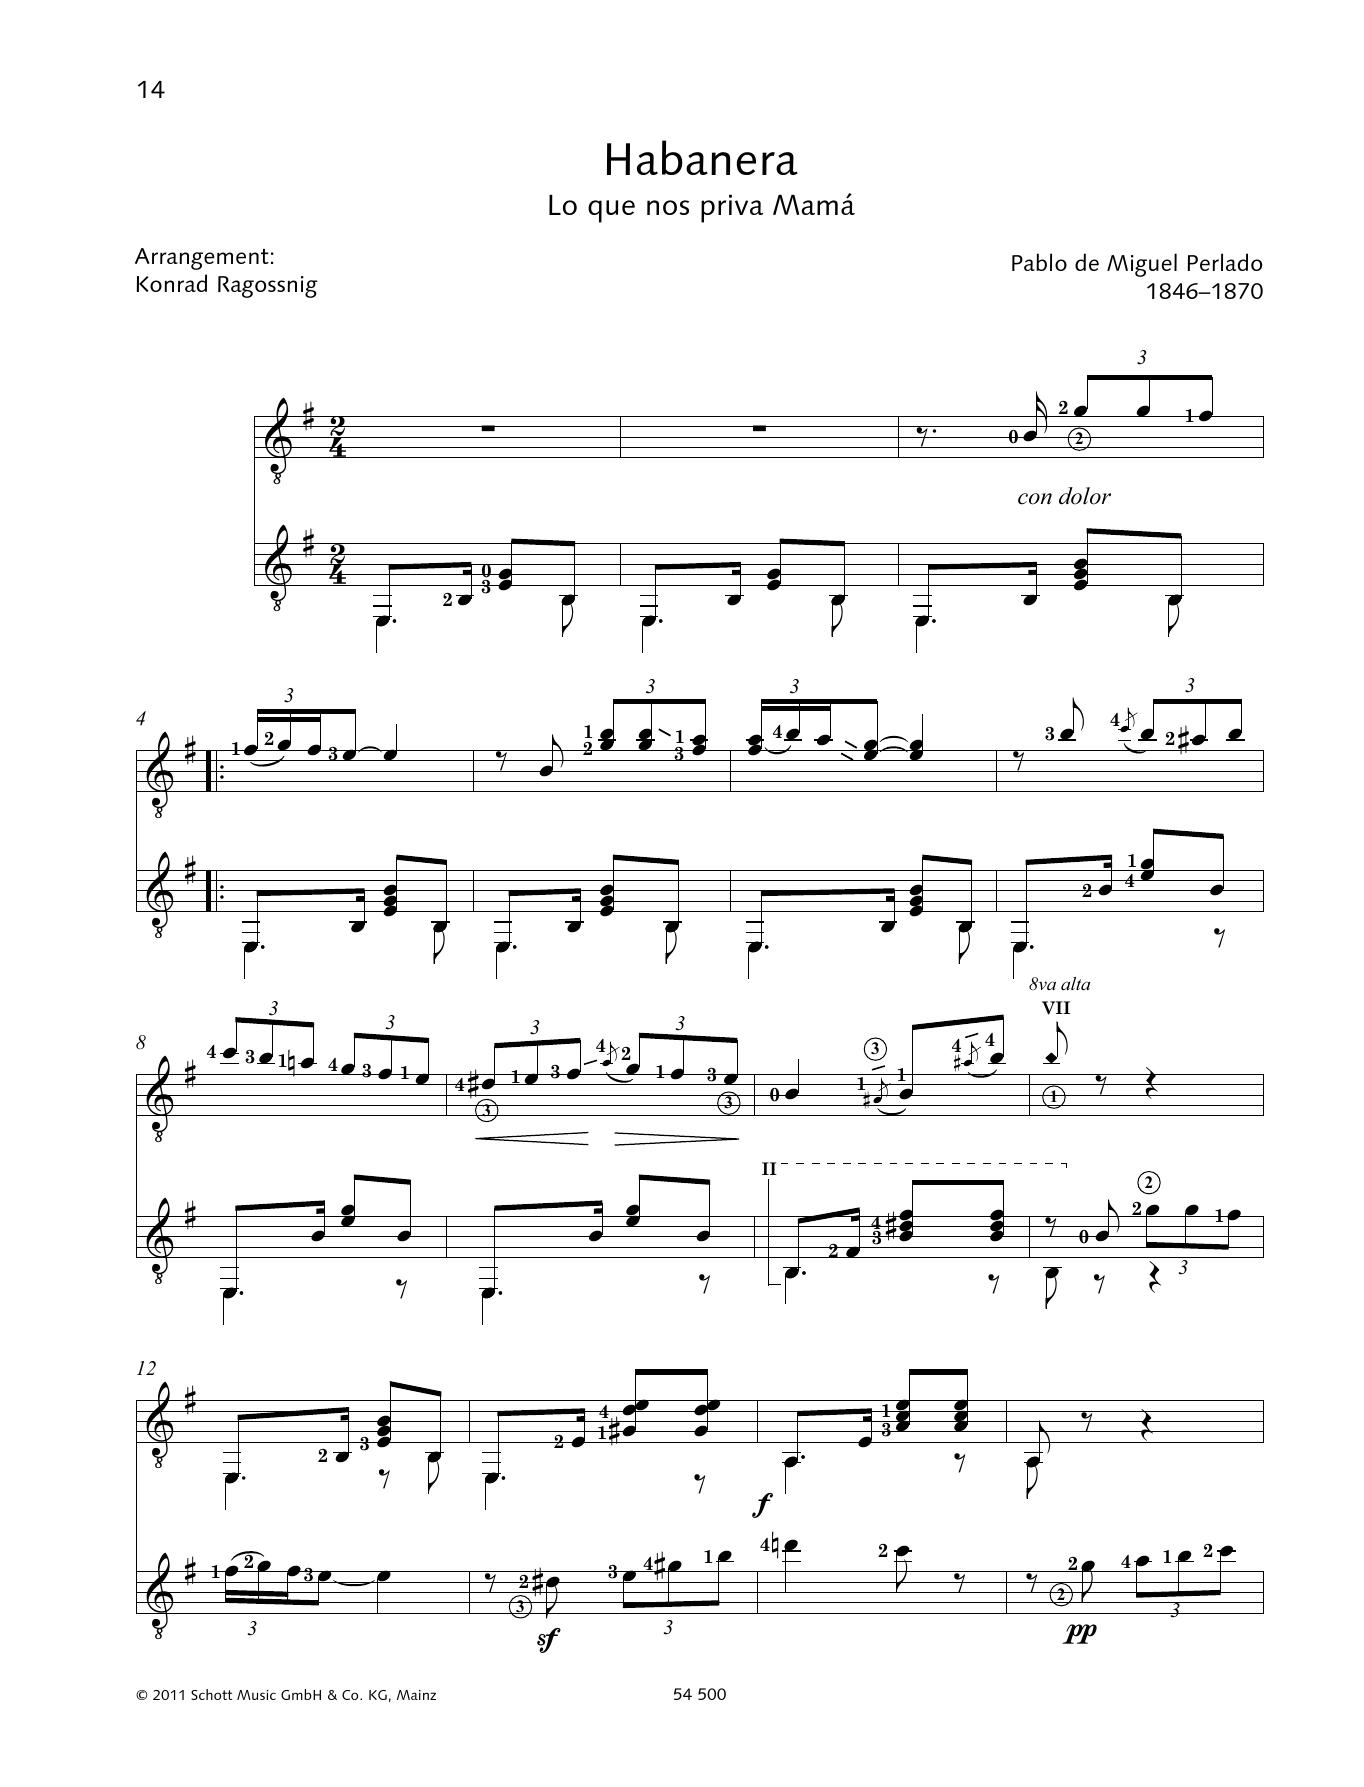 Habañera - Full Score Sheet Music